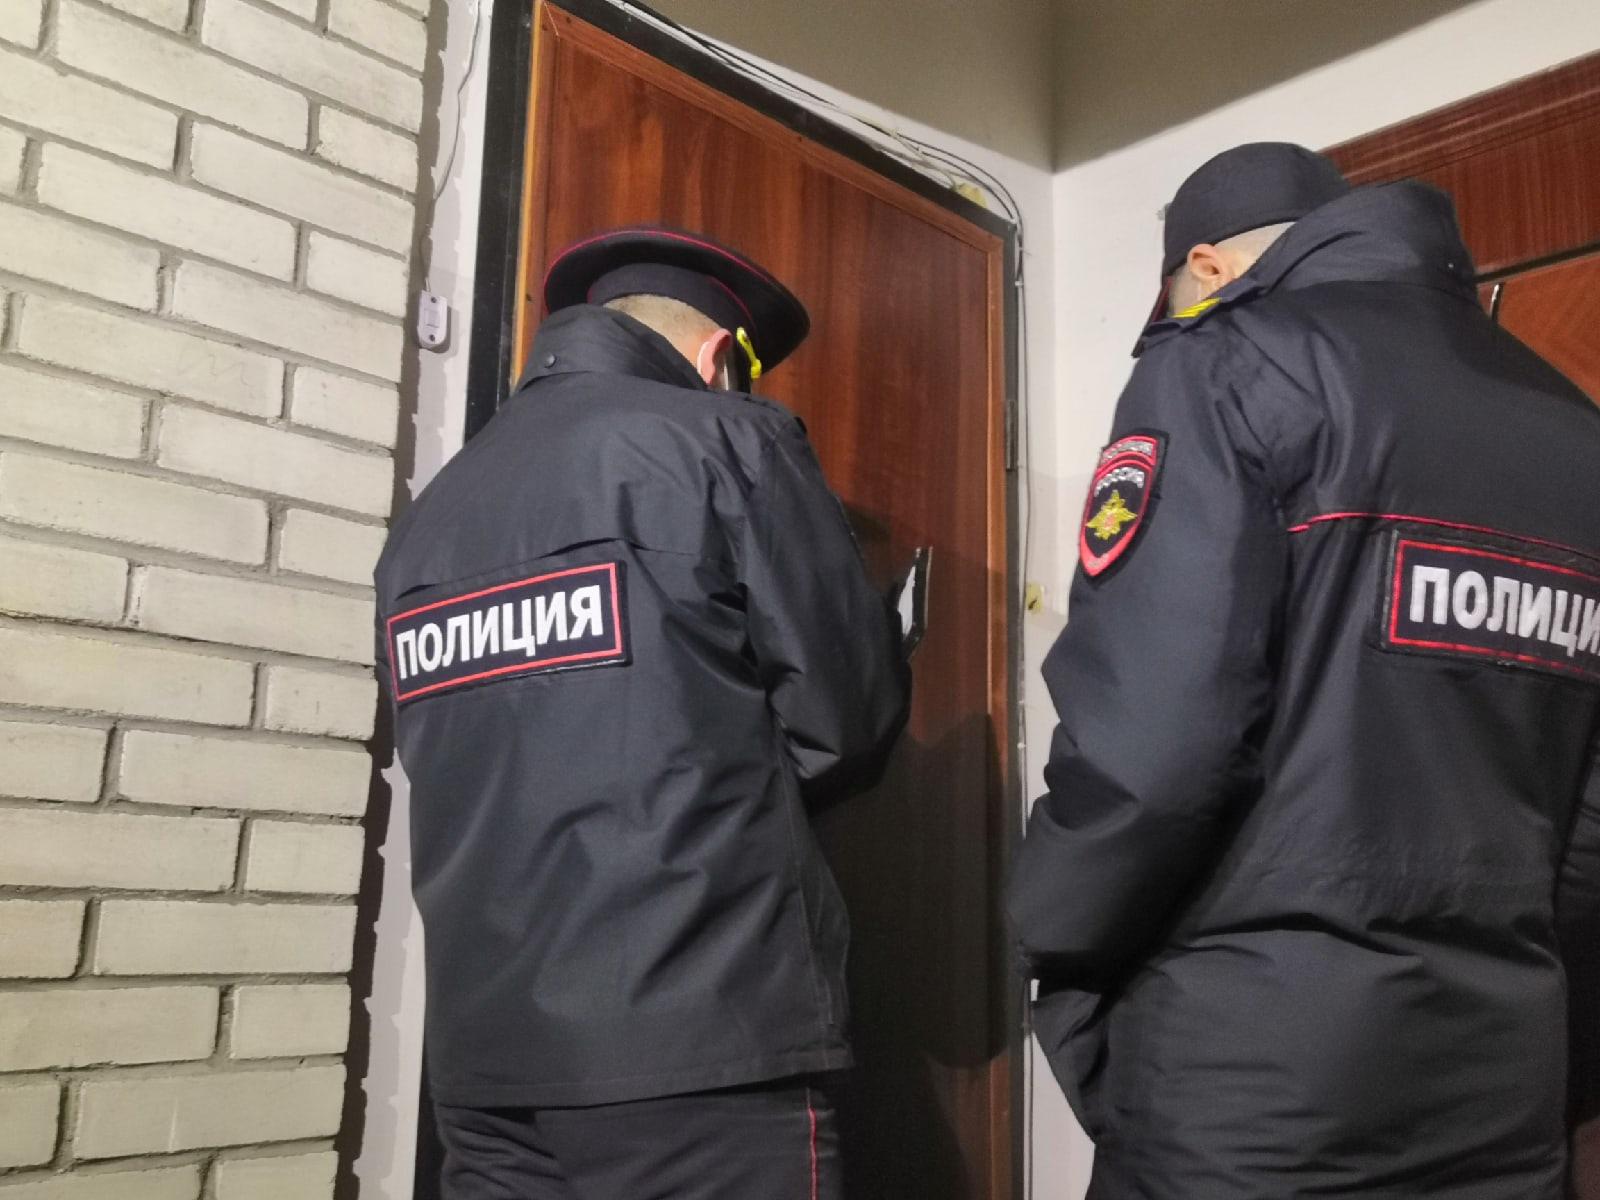 Полицейские Твери поймали мошенника, обманувшего хозяйку квартиры